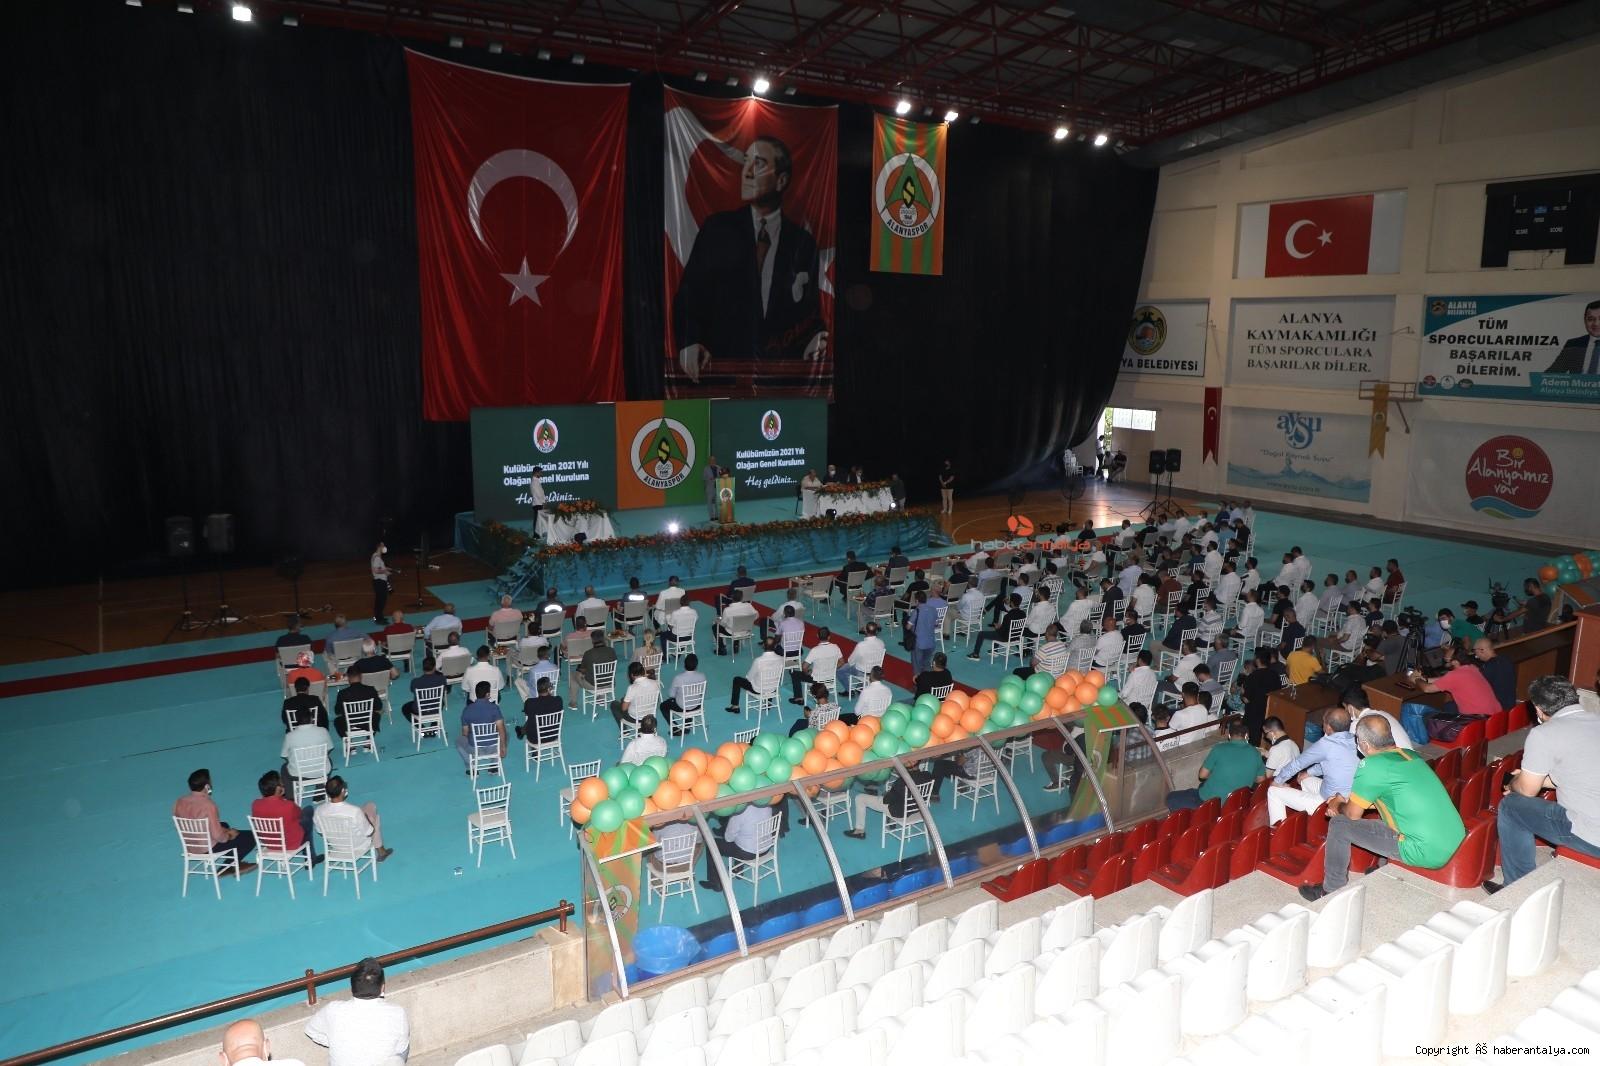 2021/06/alanyasporda-hasan-cavusoglu-guven-tazeledi-20210609AW34-7.jpg